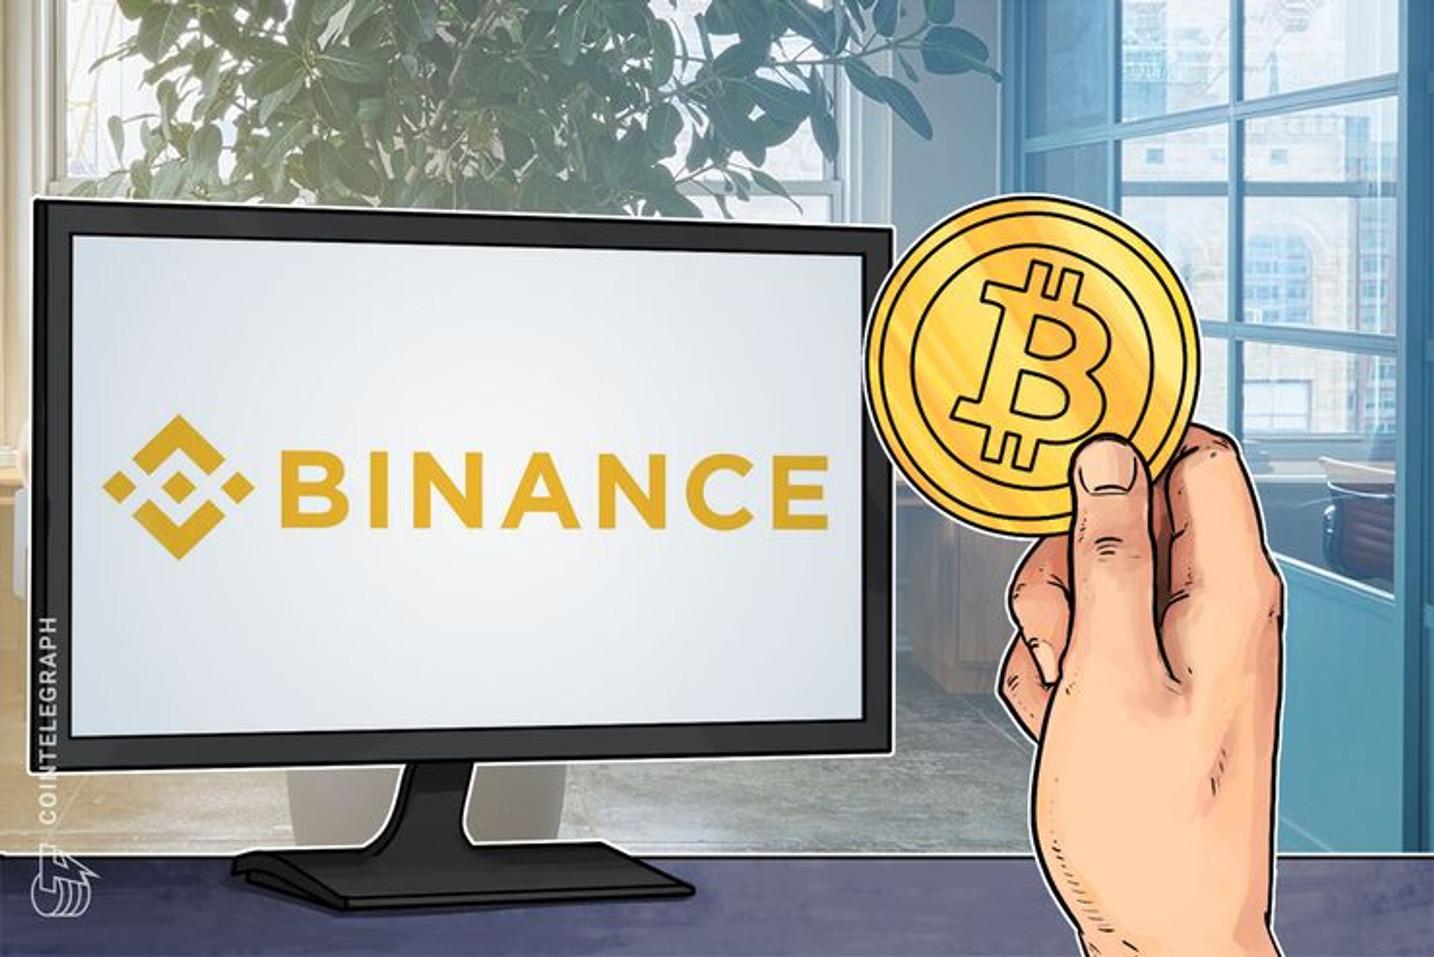 Binance ofrecerá 12 encuentros virtuales sobre criptomonedas para Latinoamérica